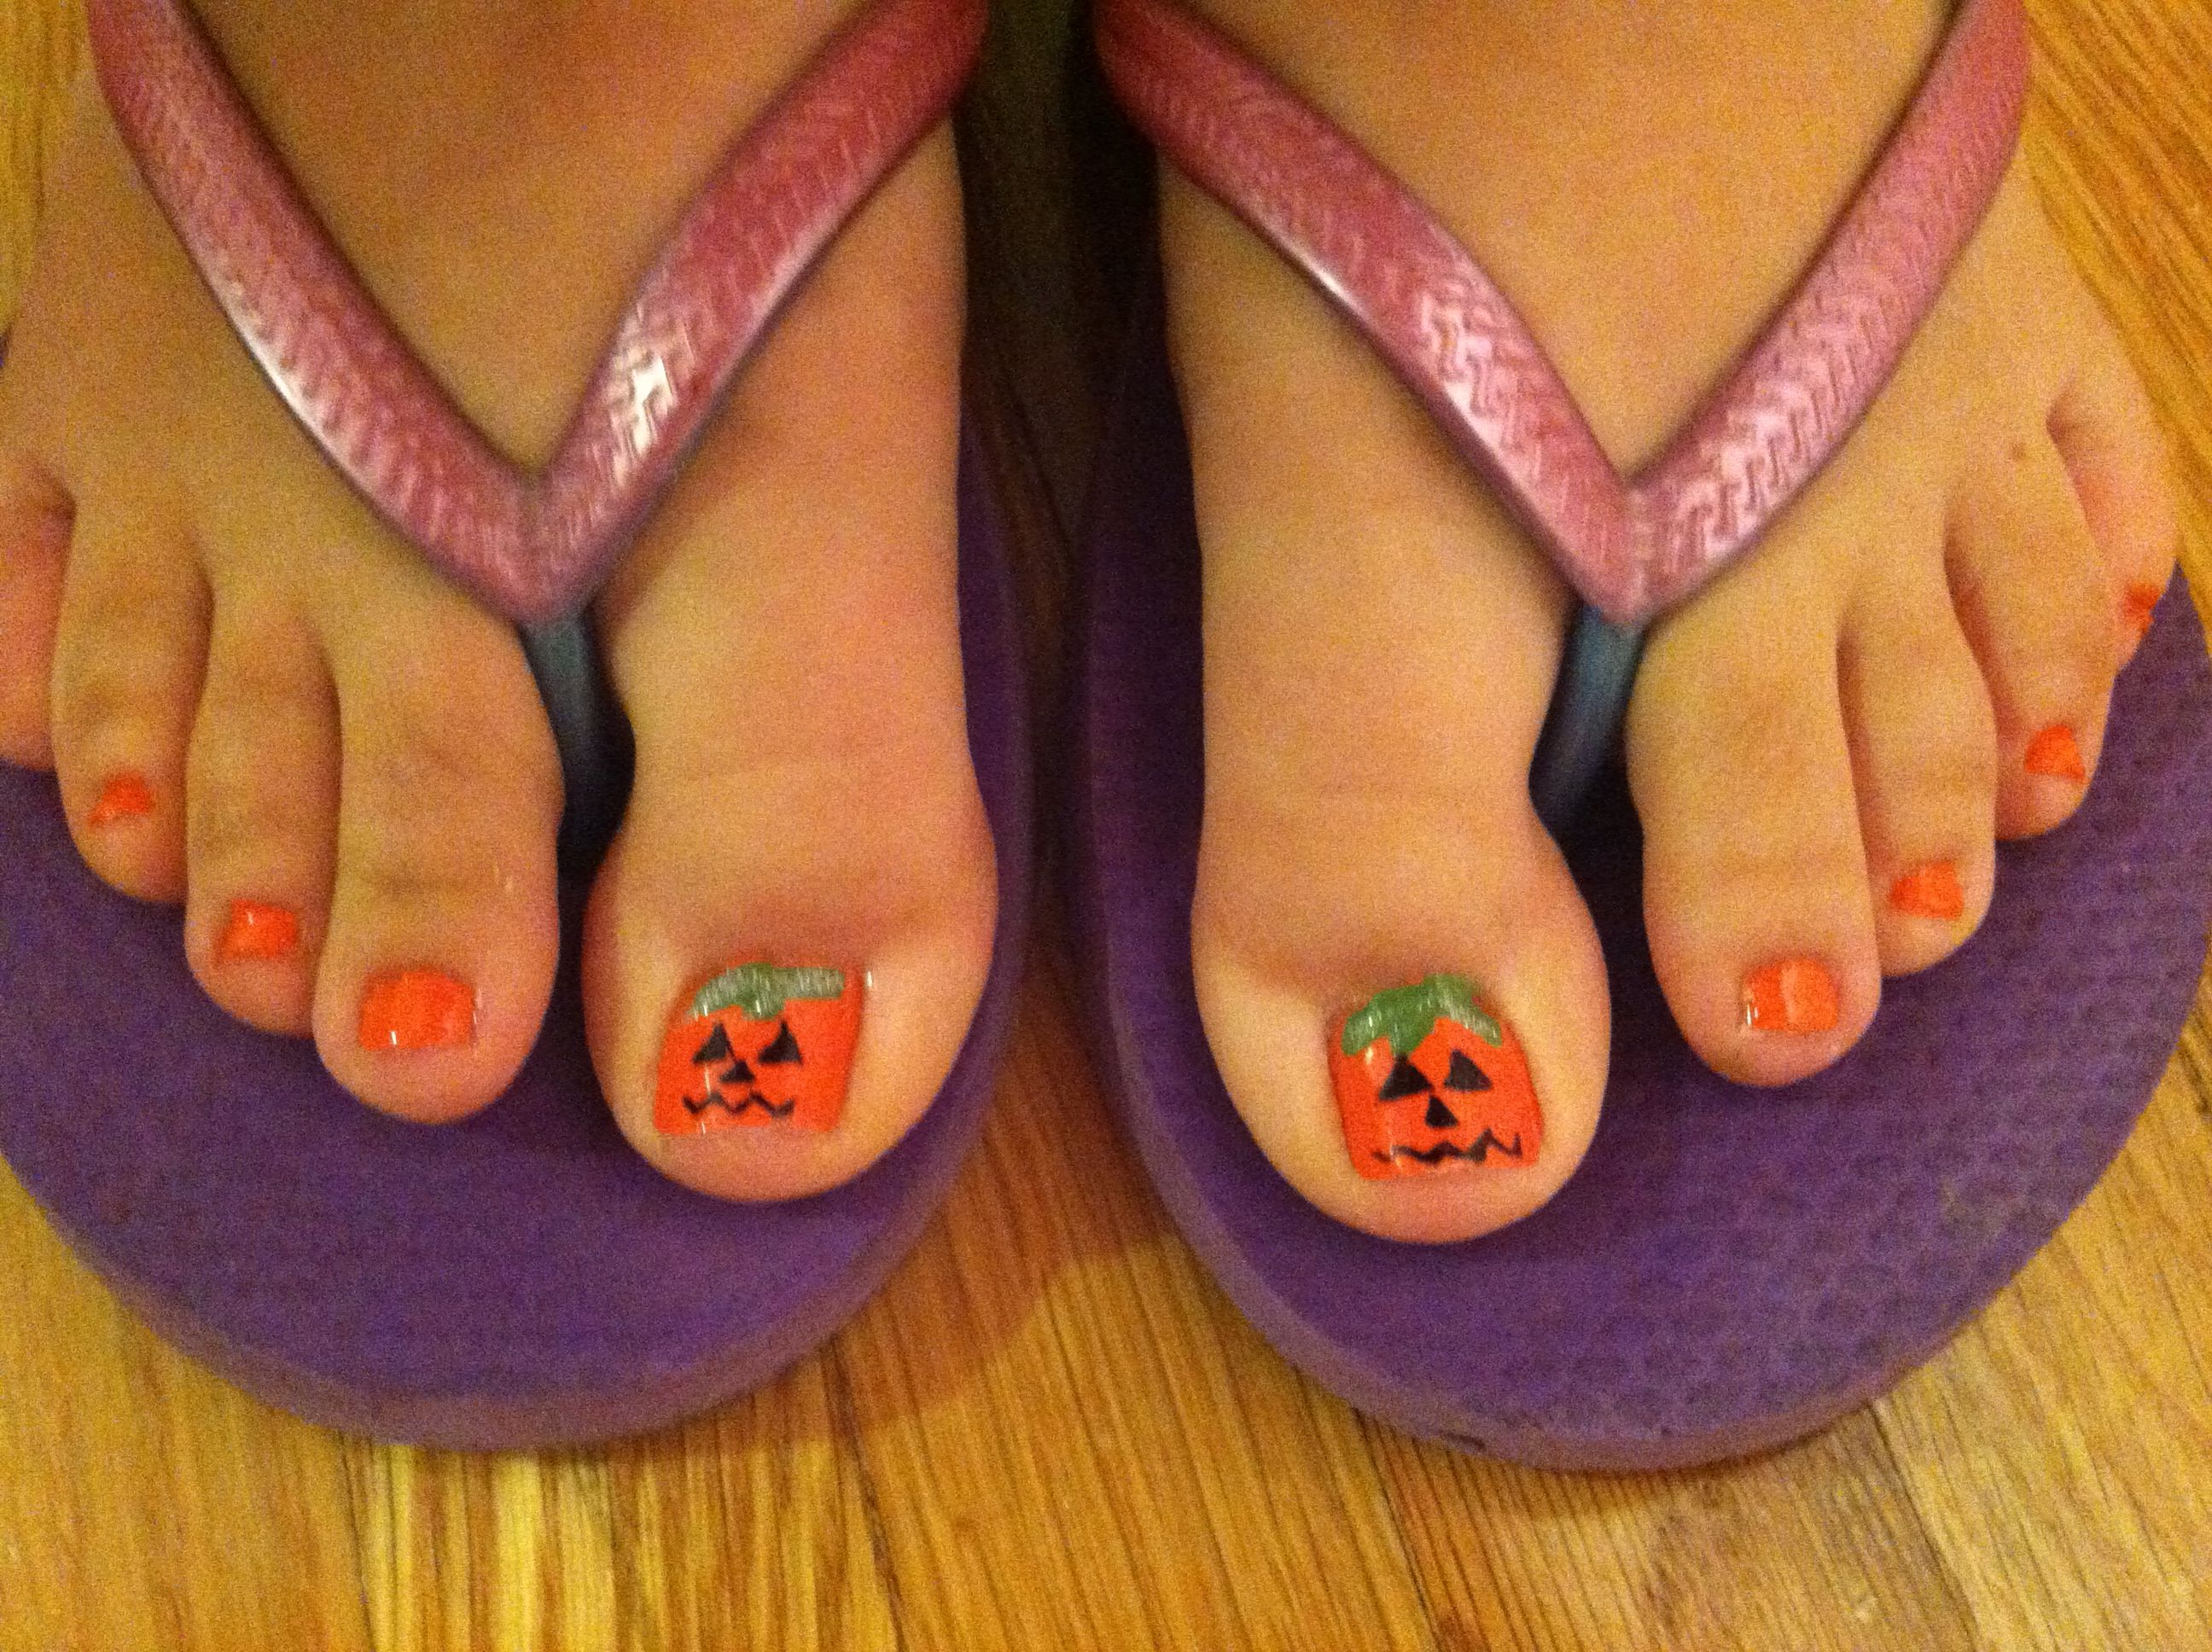 Halloween Toe Nail Art | Halloween Toe Nail Art | Pinterest ...